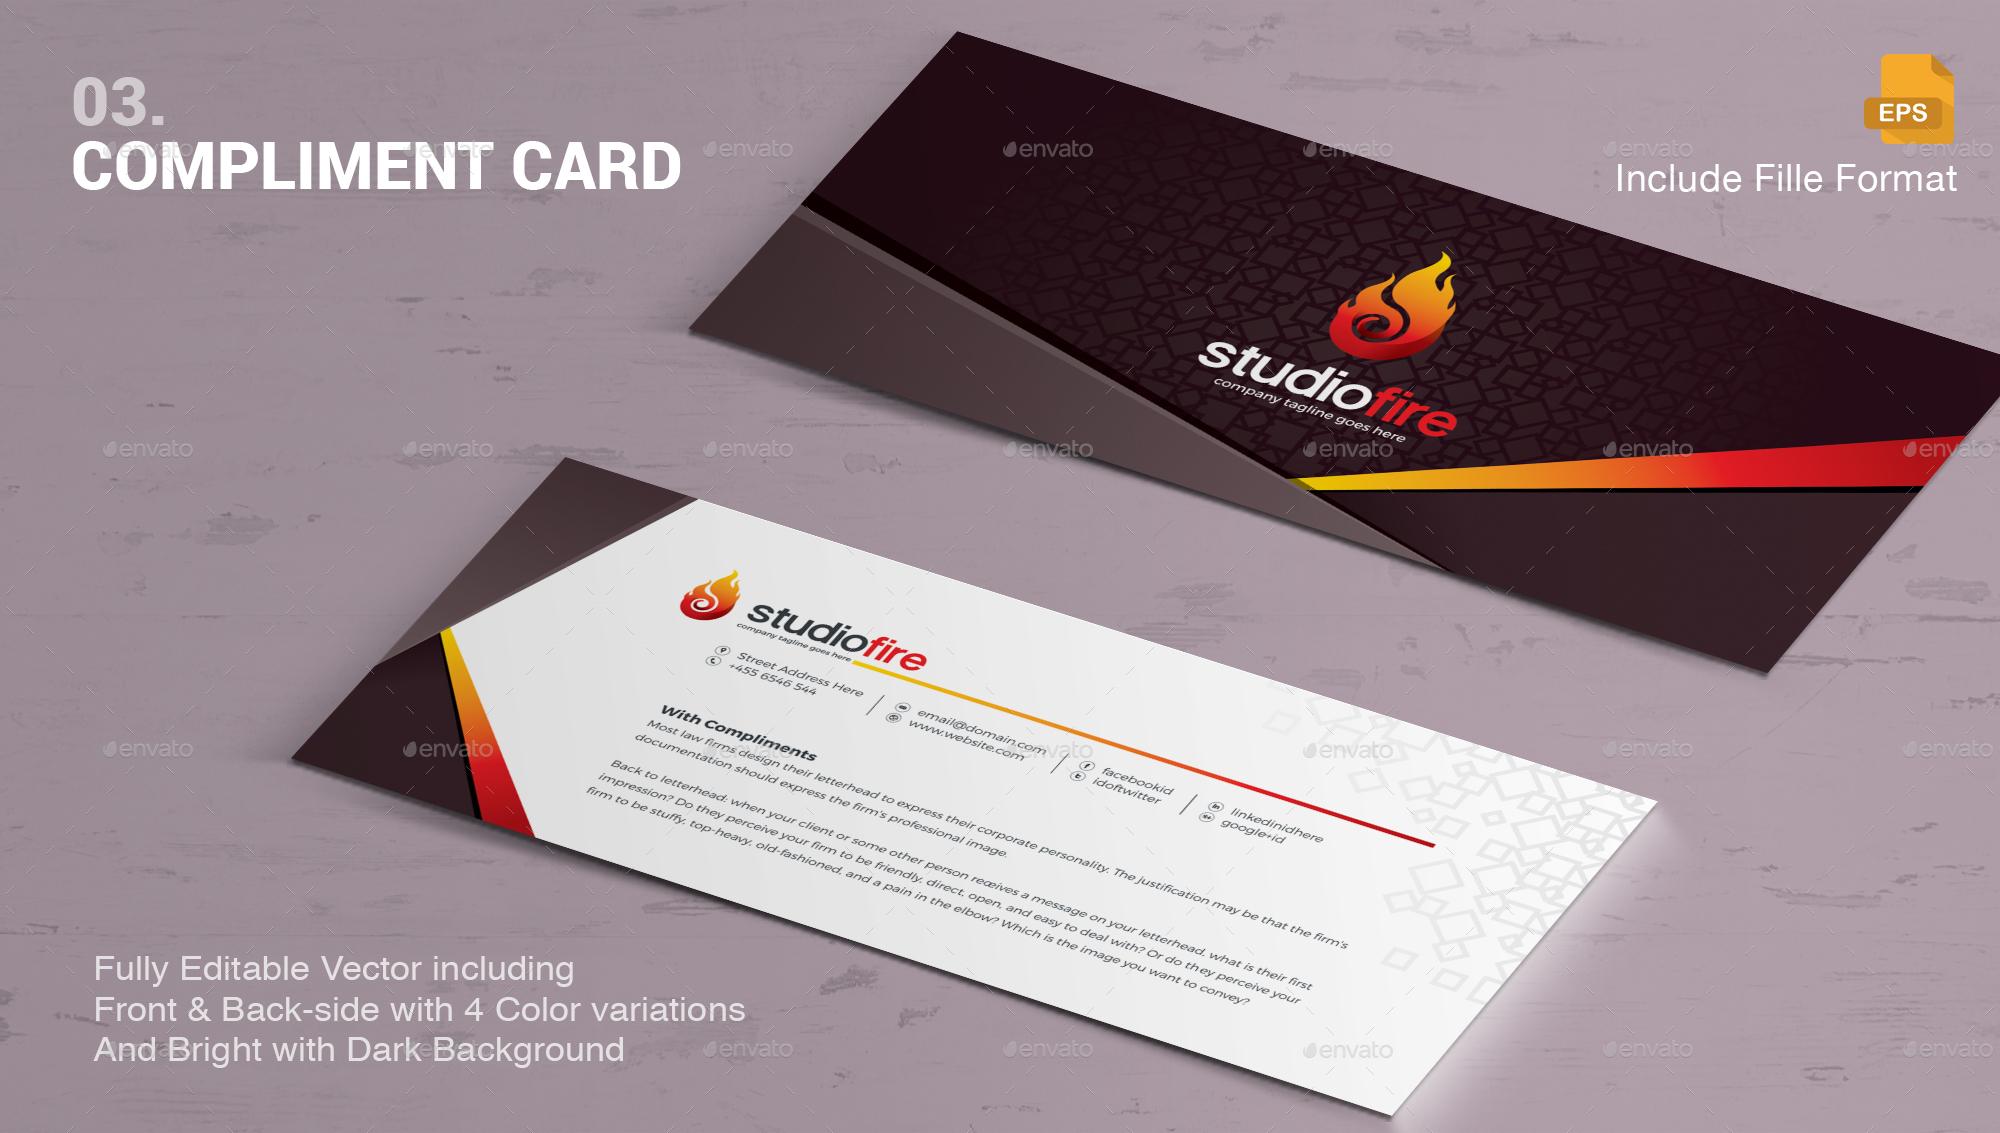 Branding Identity Design by ContestDesign